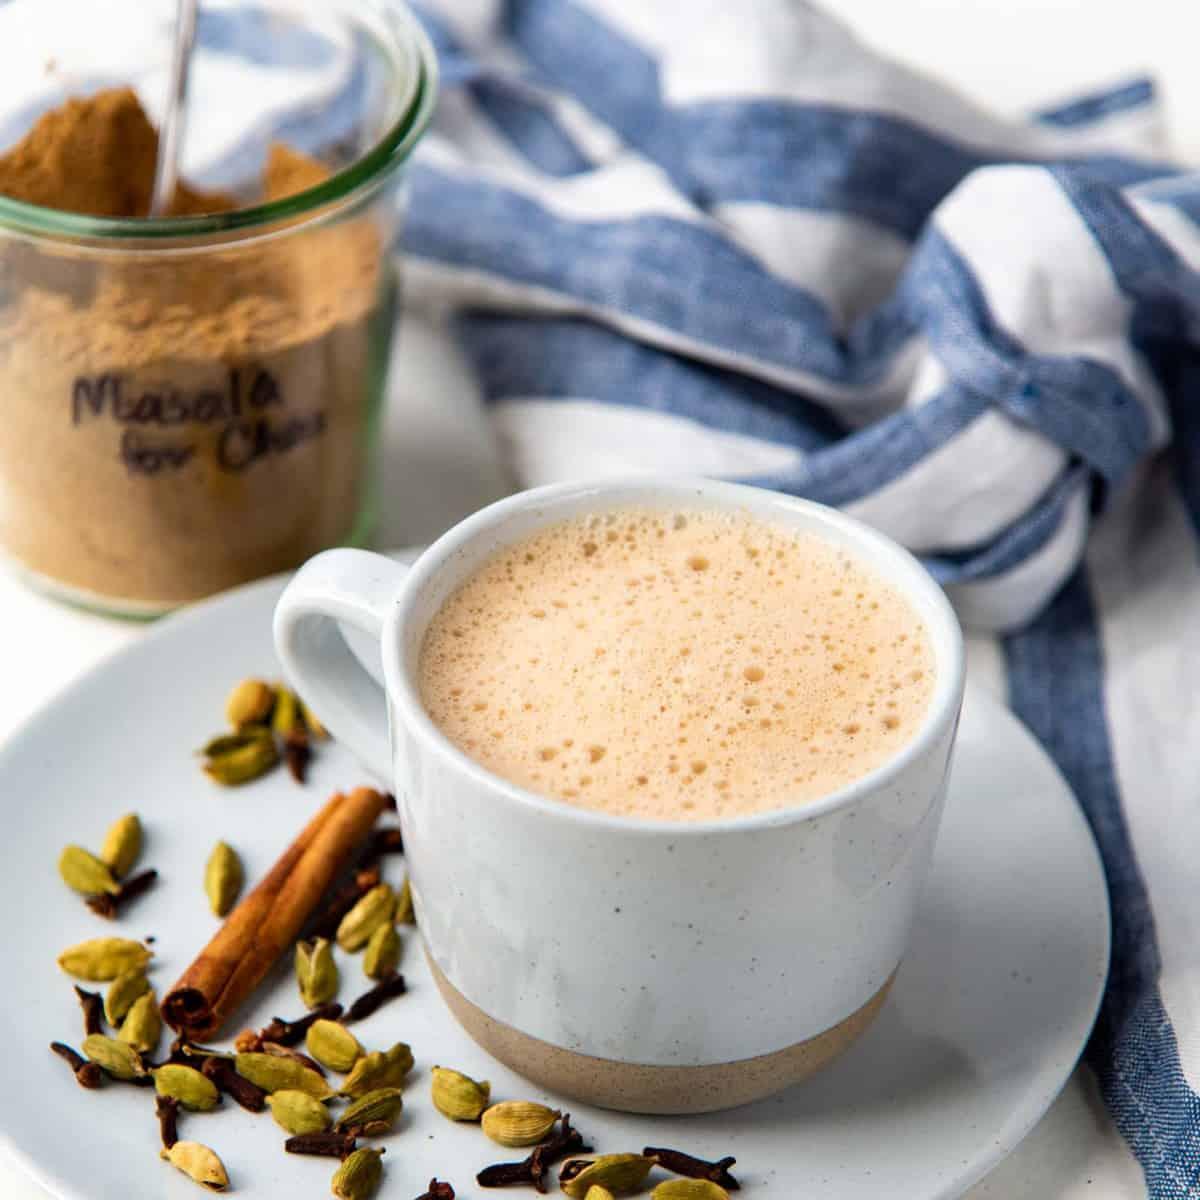 Authentic Masala Chai Recipe The Flavor Bender